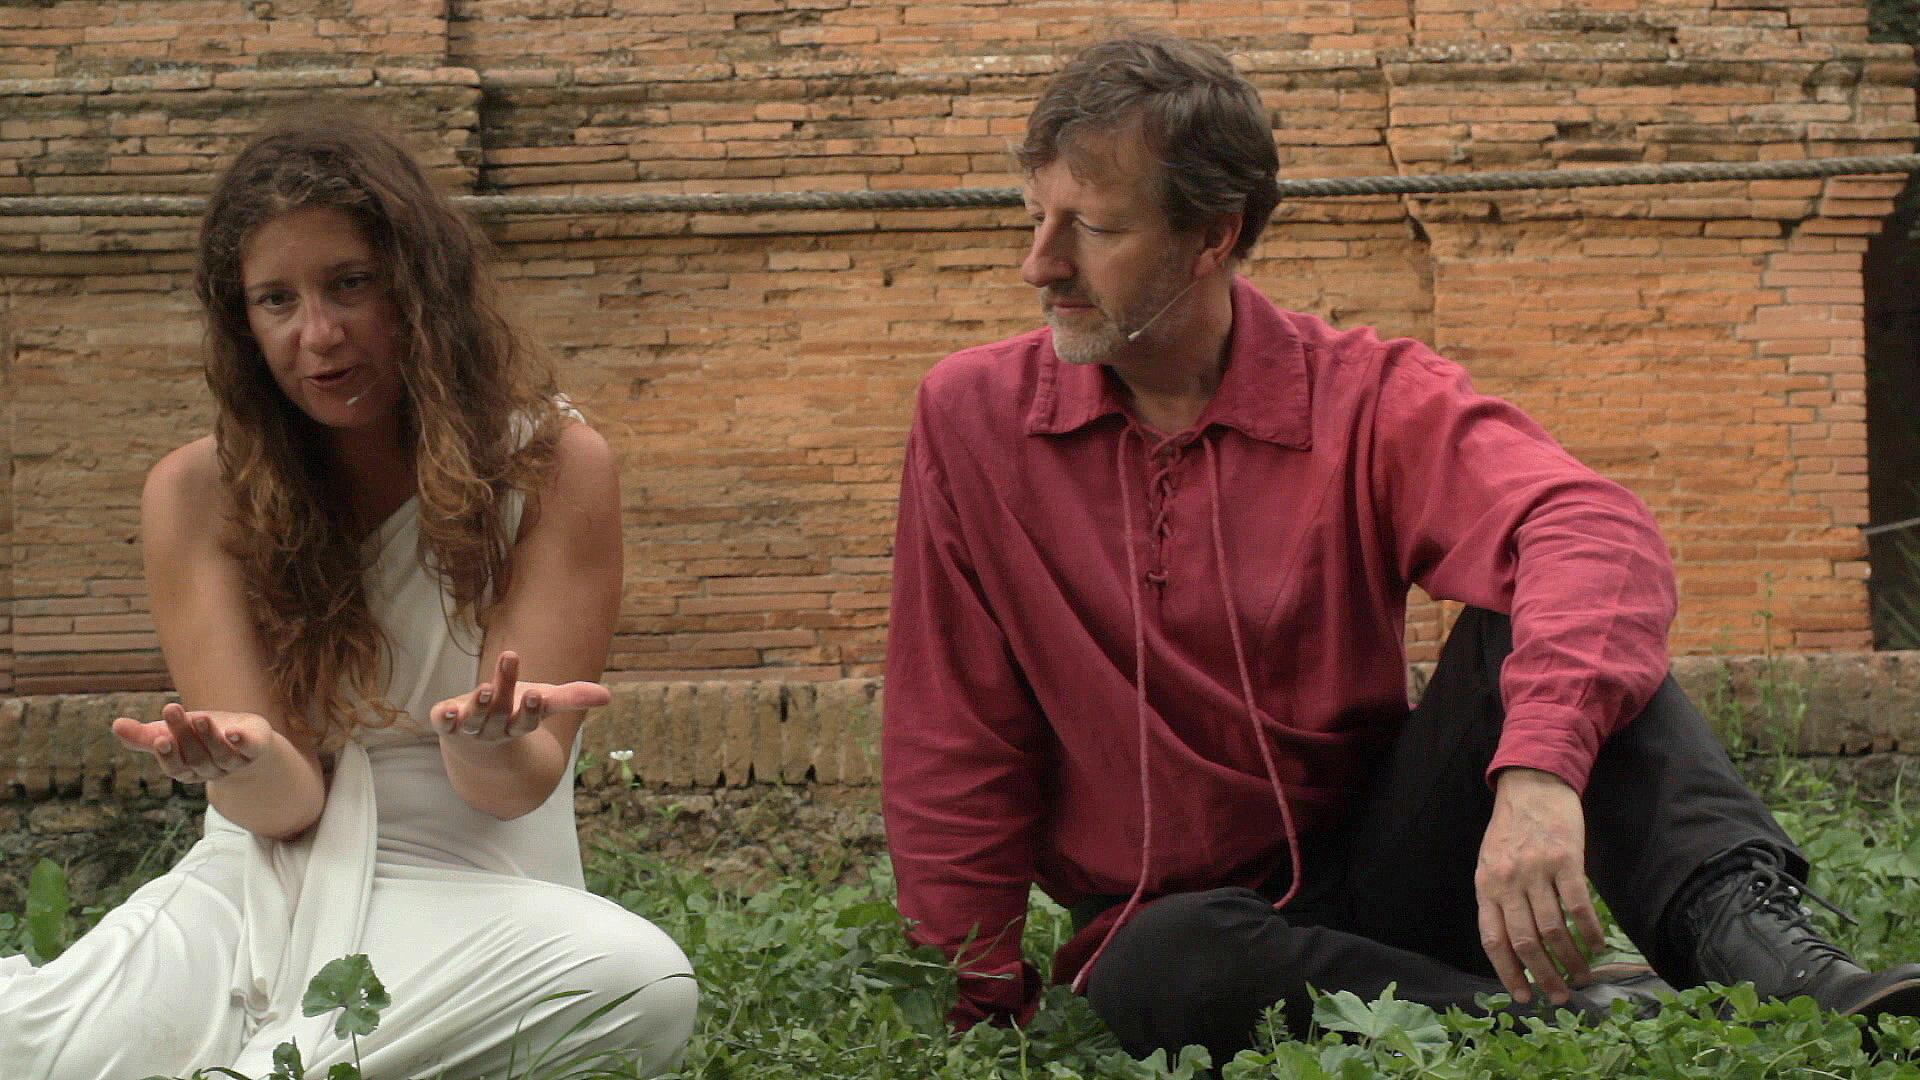 Angerona - Appian Park Michael Harvey, Paola Balbi